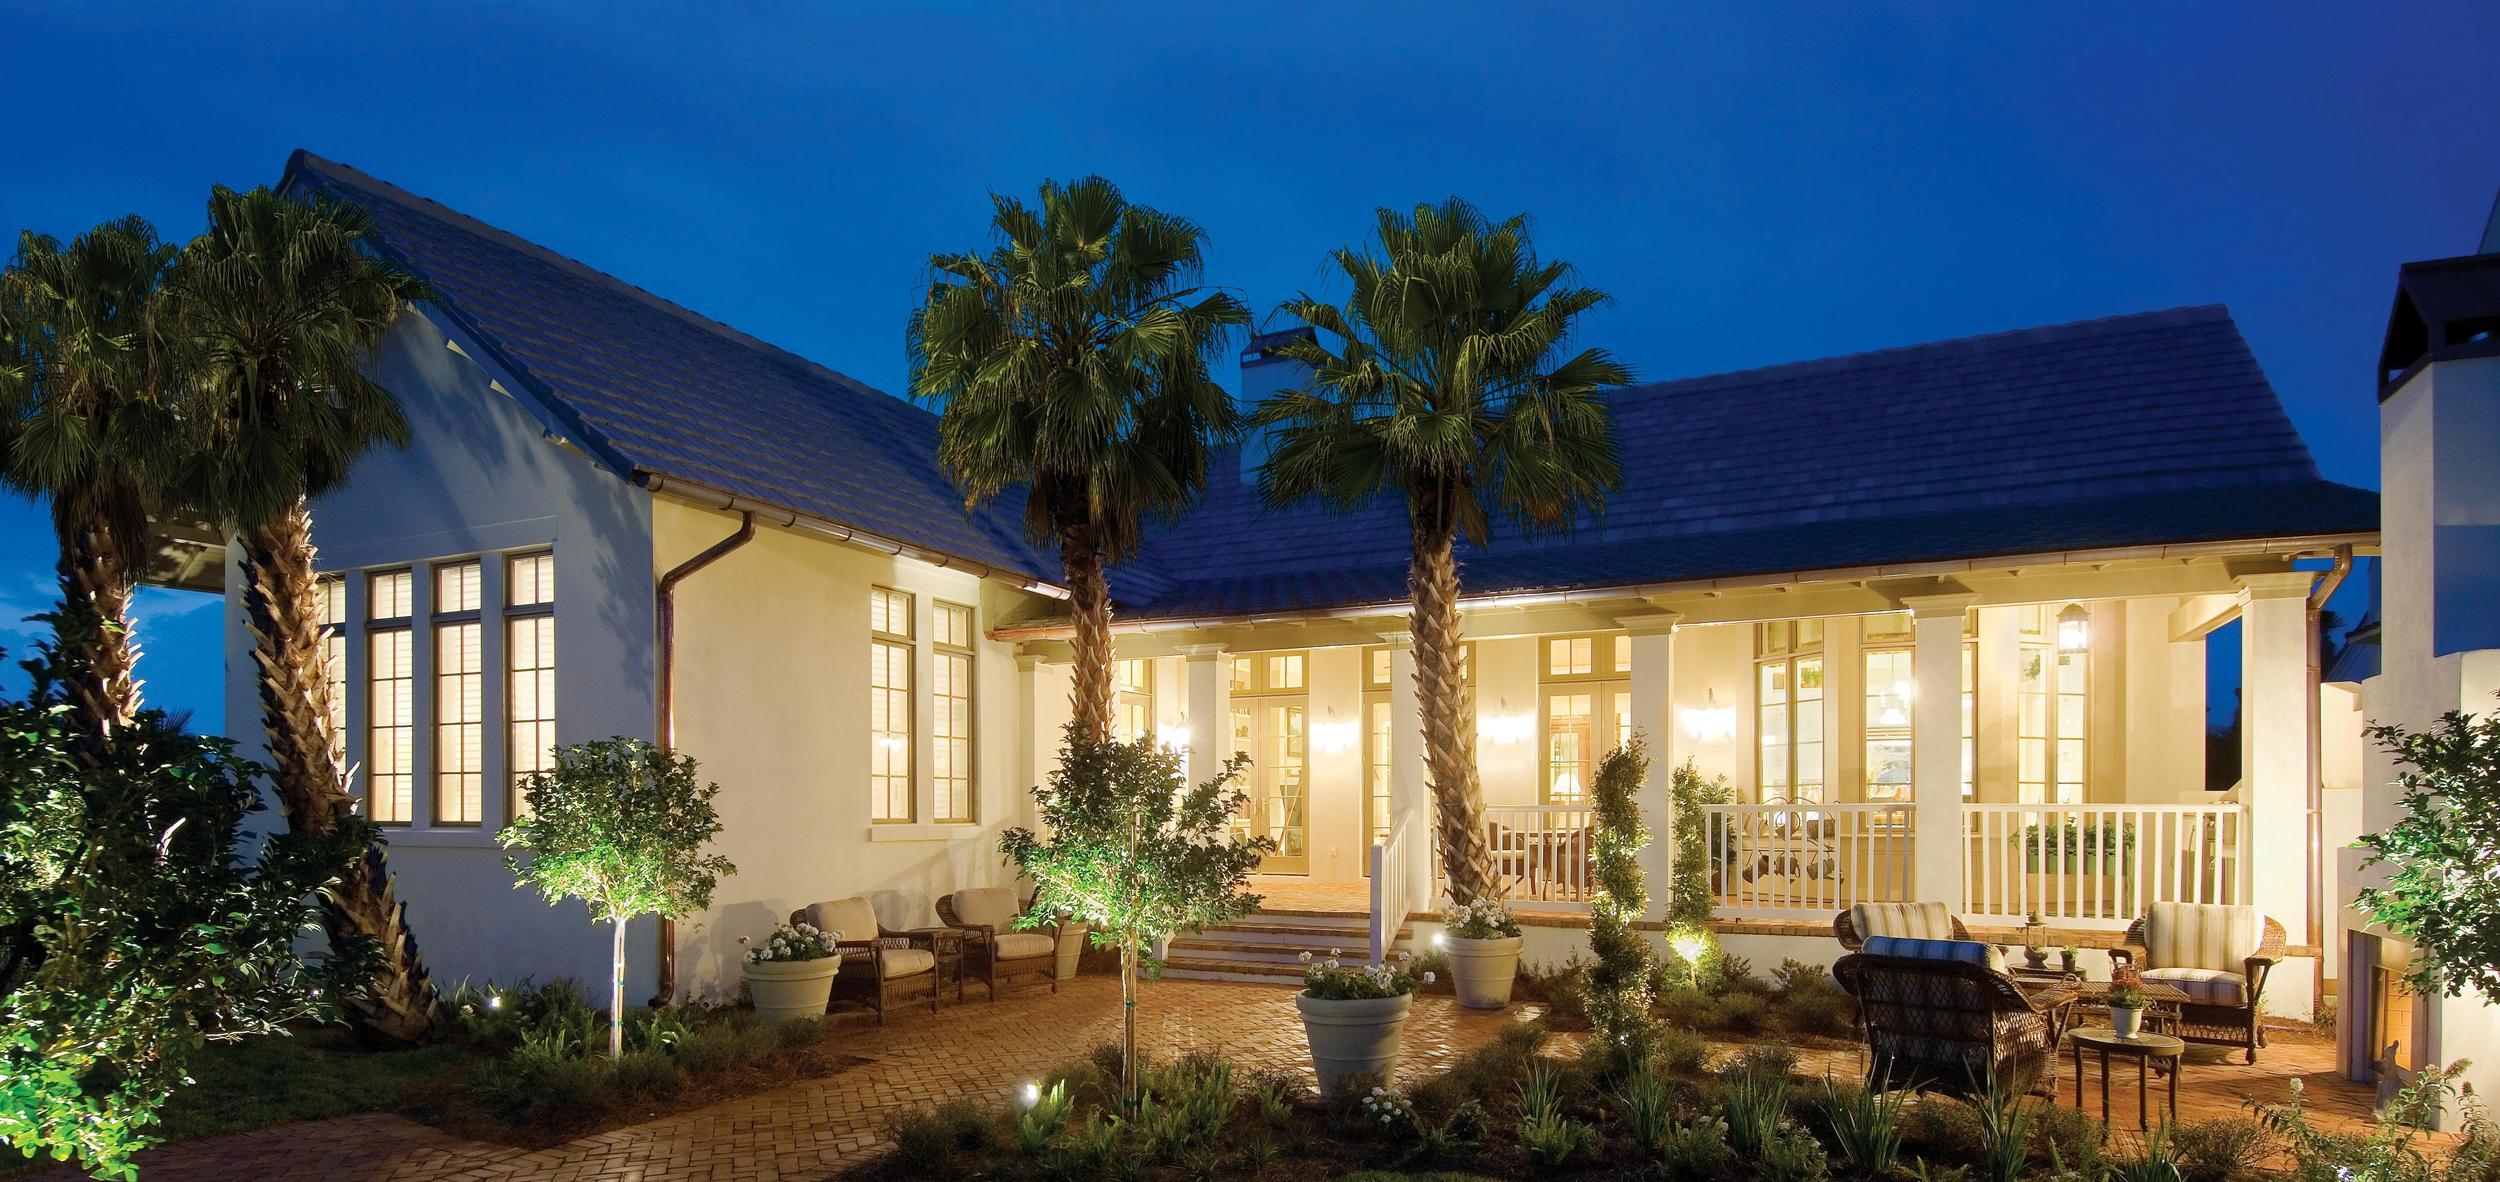 Golf Cottage Magnolia Rear.jpg